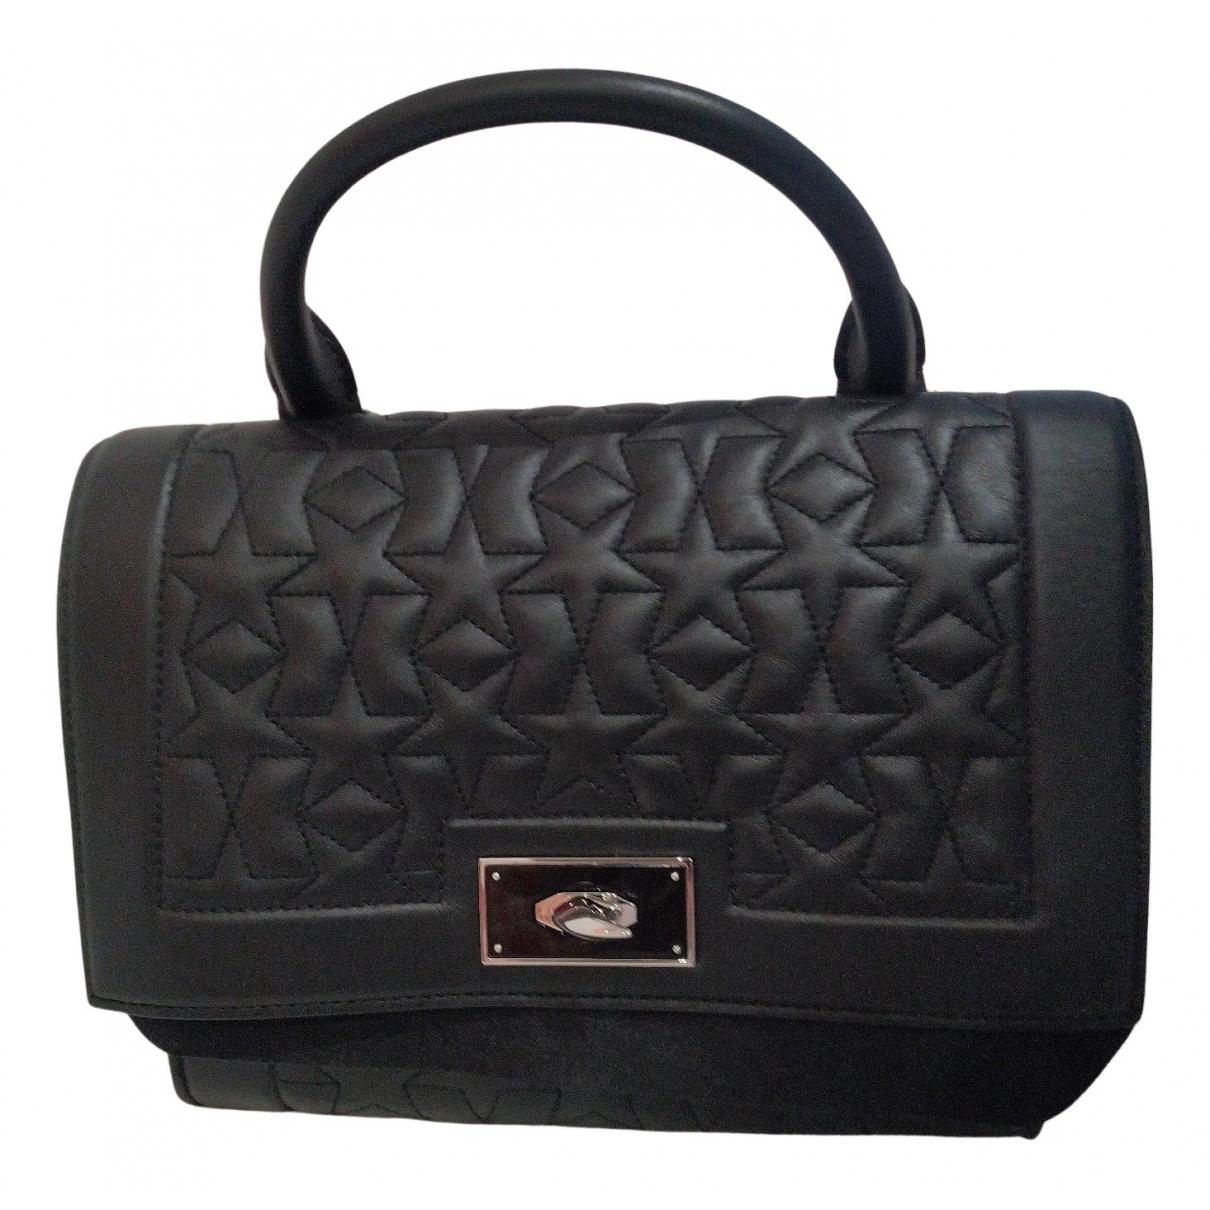 Givenchy Shark Handtasche in  Schwarz Leder